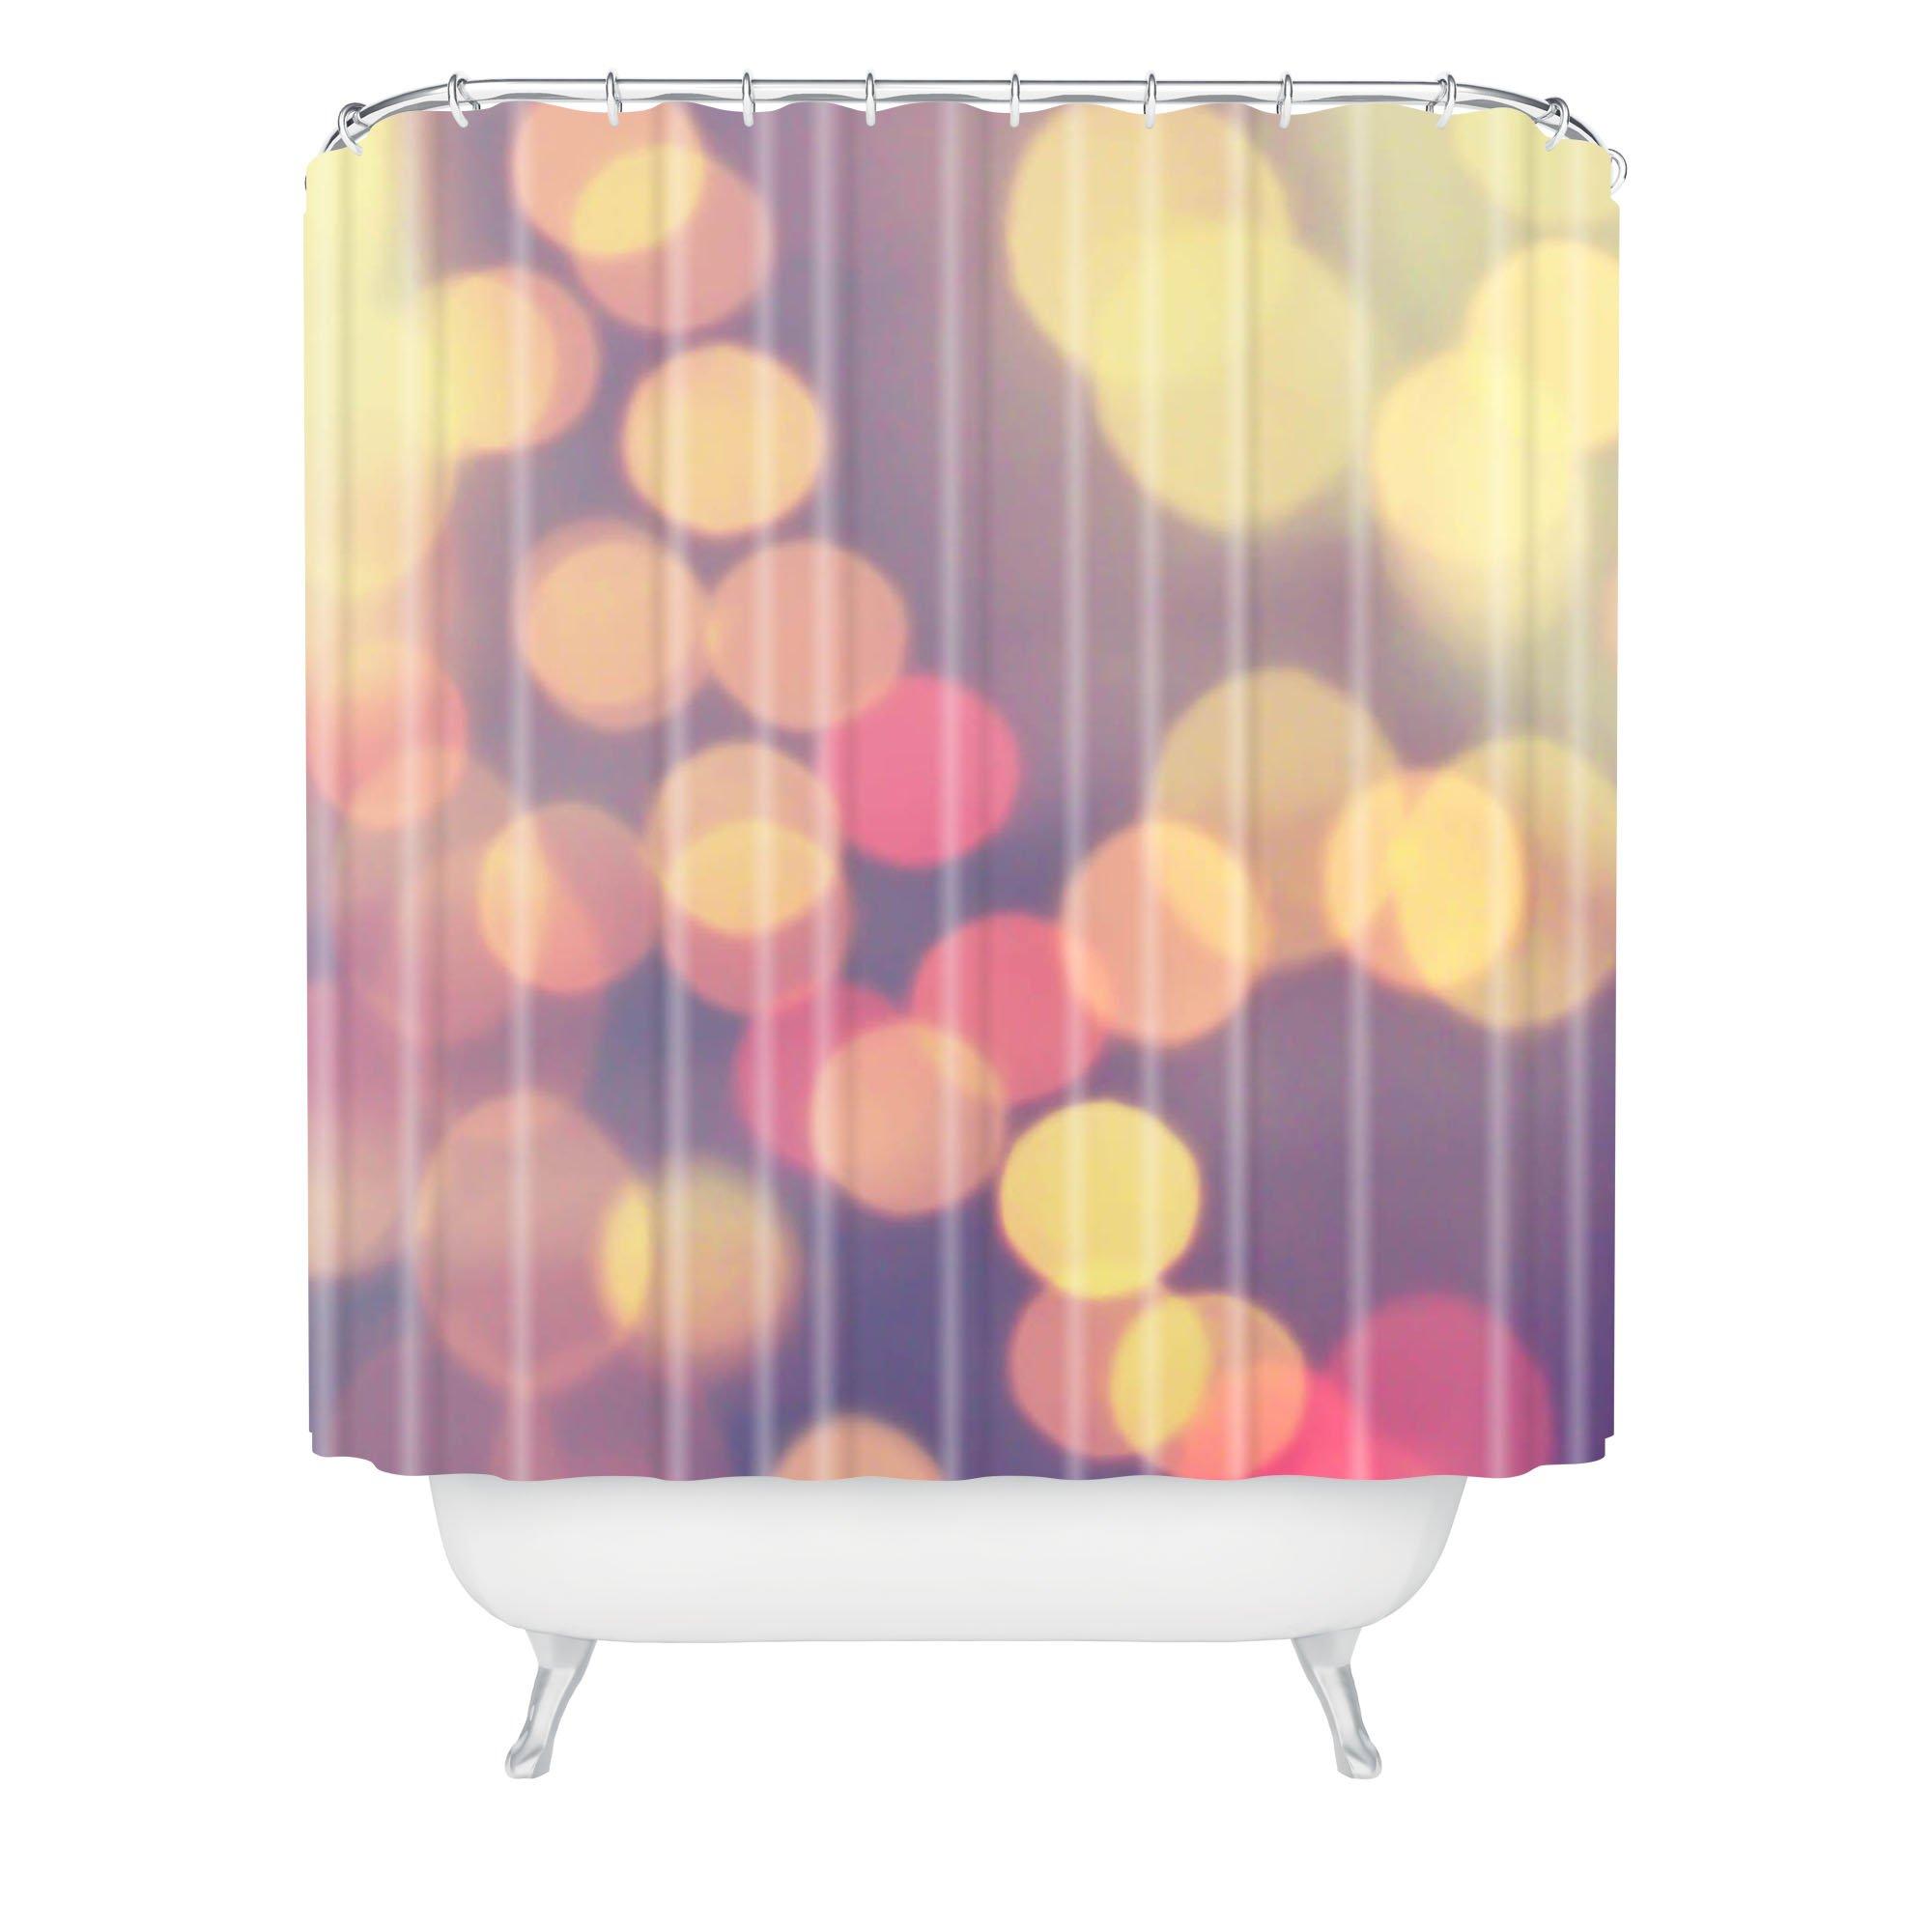 "Deny Designs Shannon Clark Sweet Dreams Shower Curtain, 69"" x 72"""